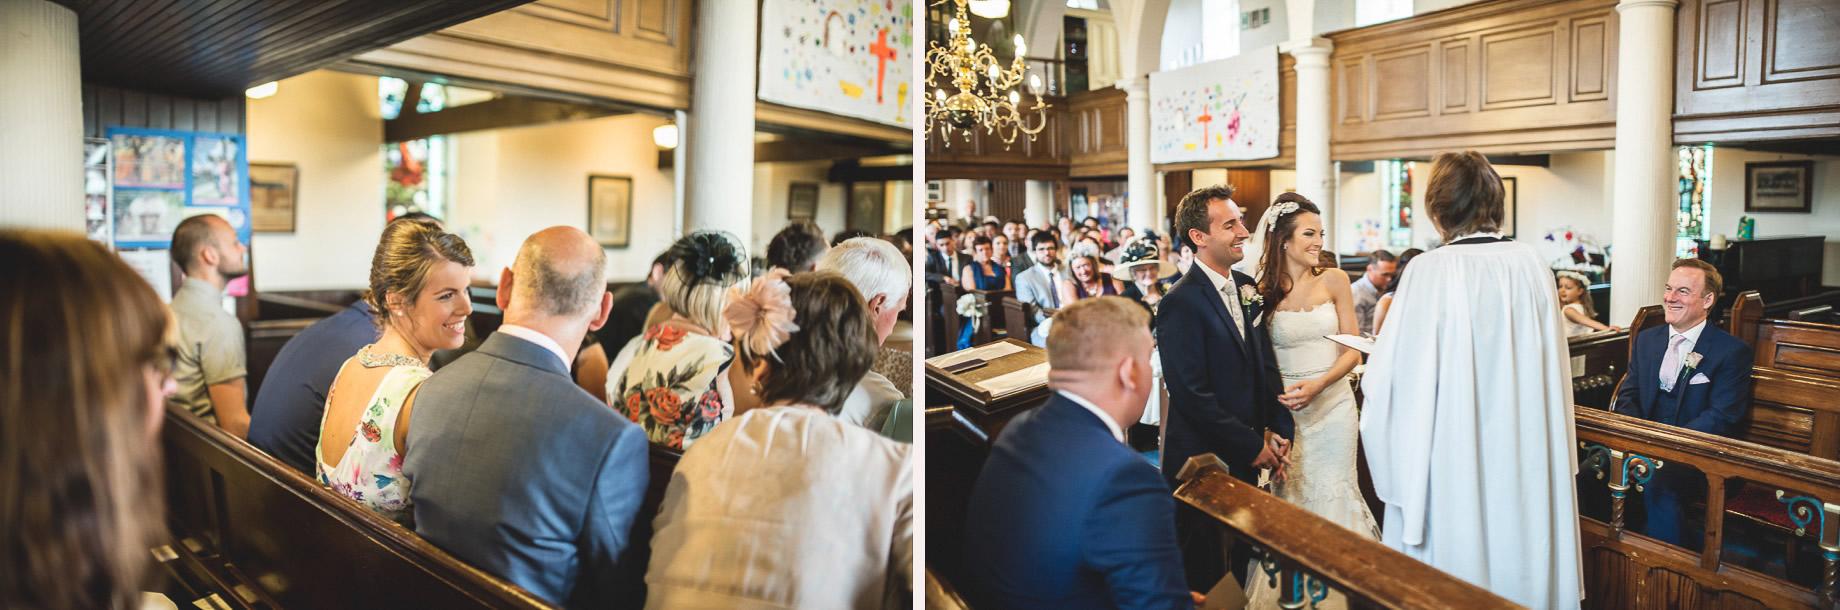 Helen and Matt's Wedding at Mitton Hall 046